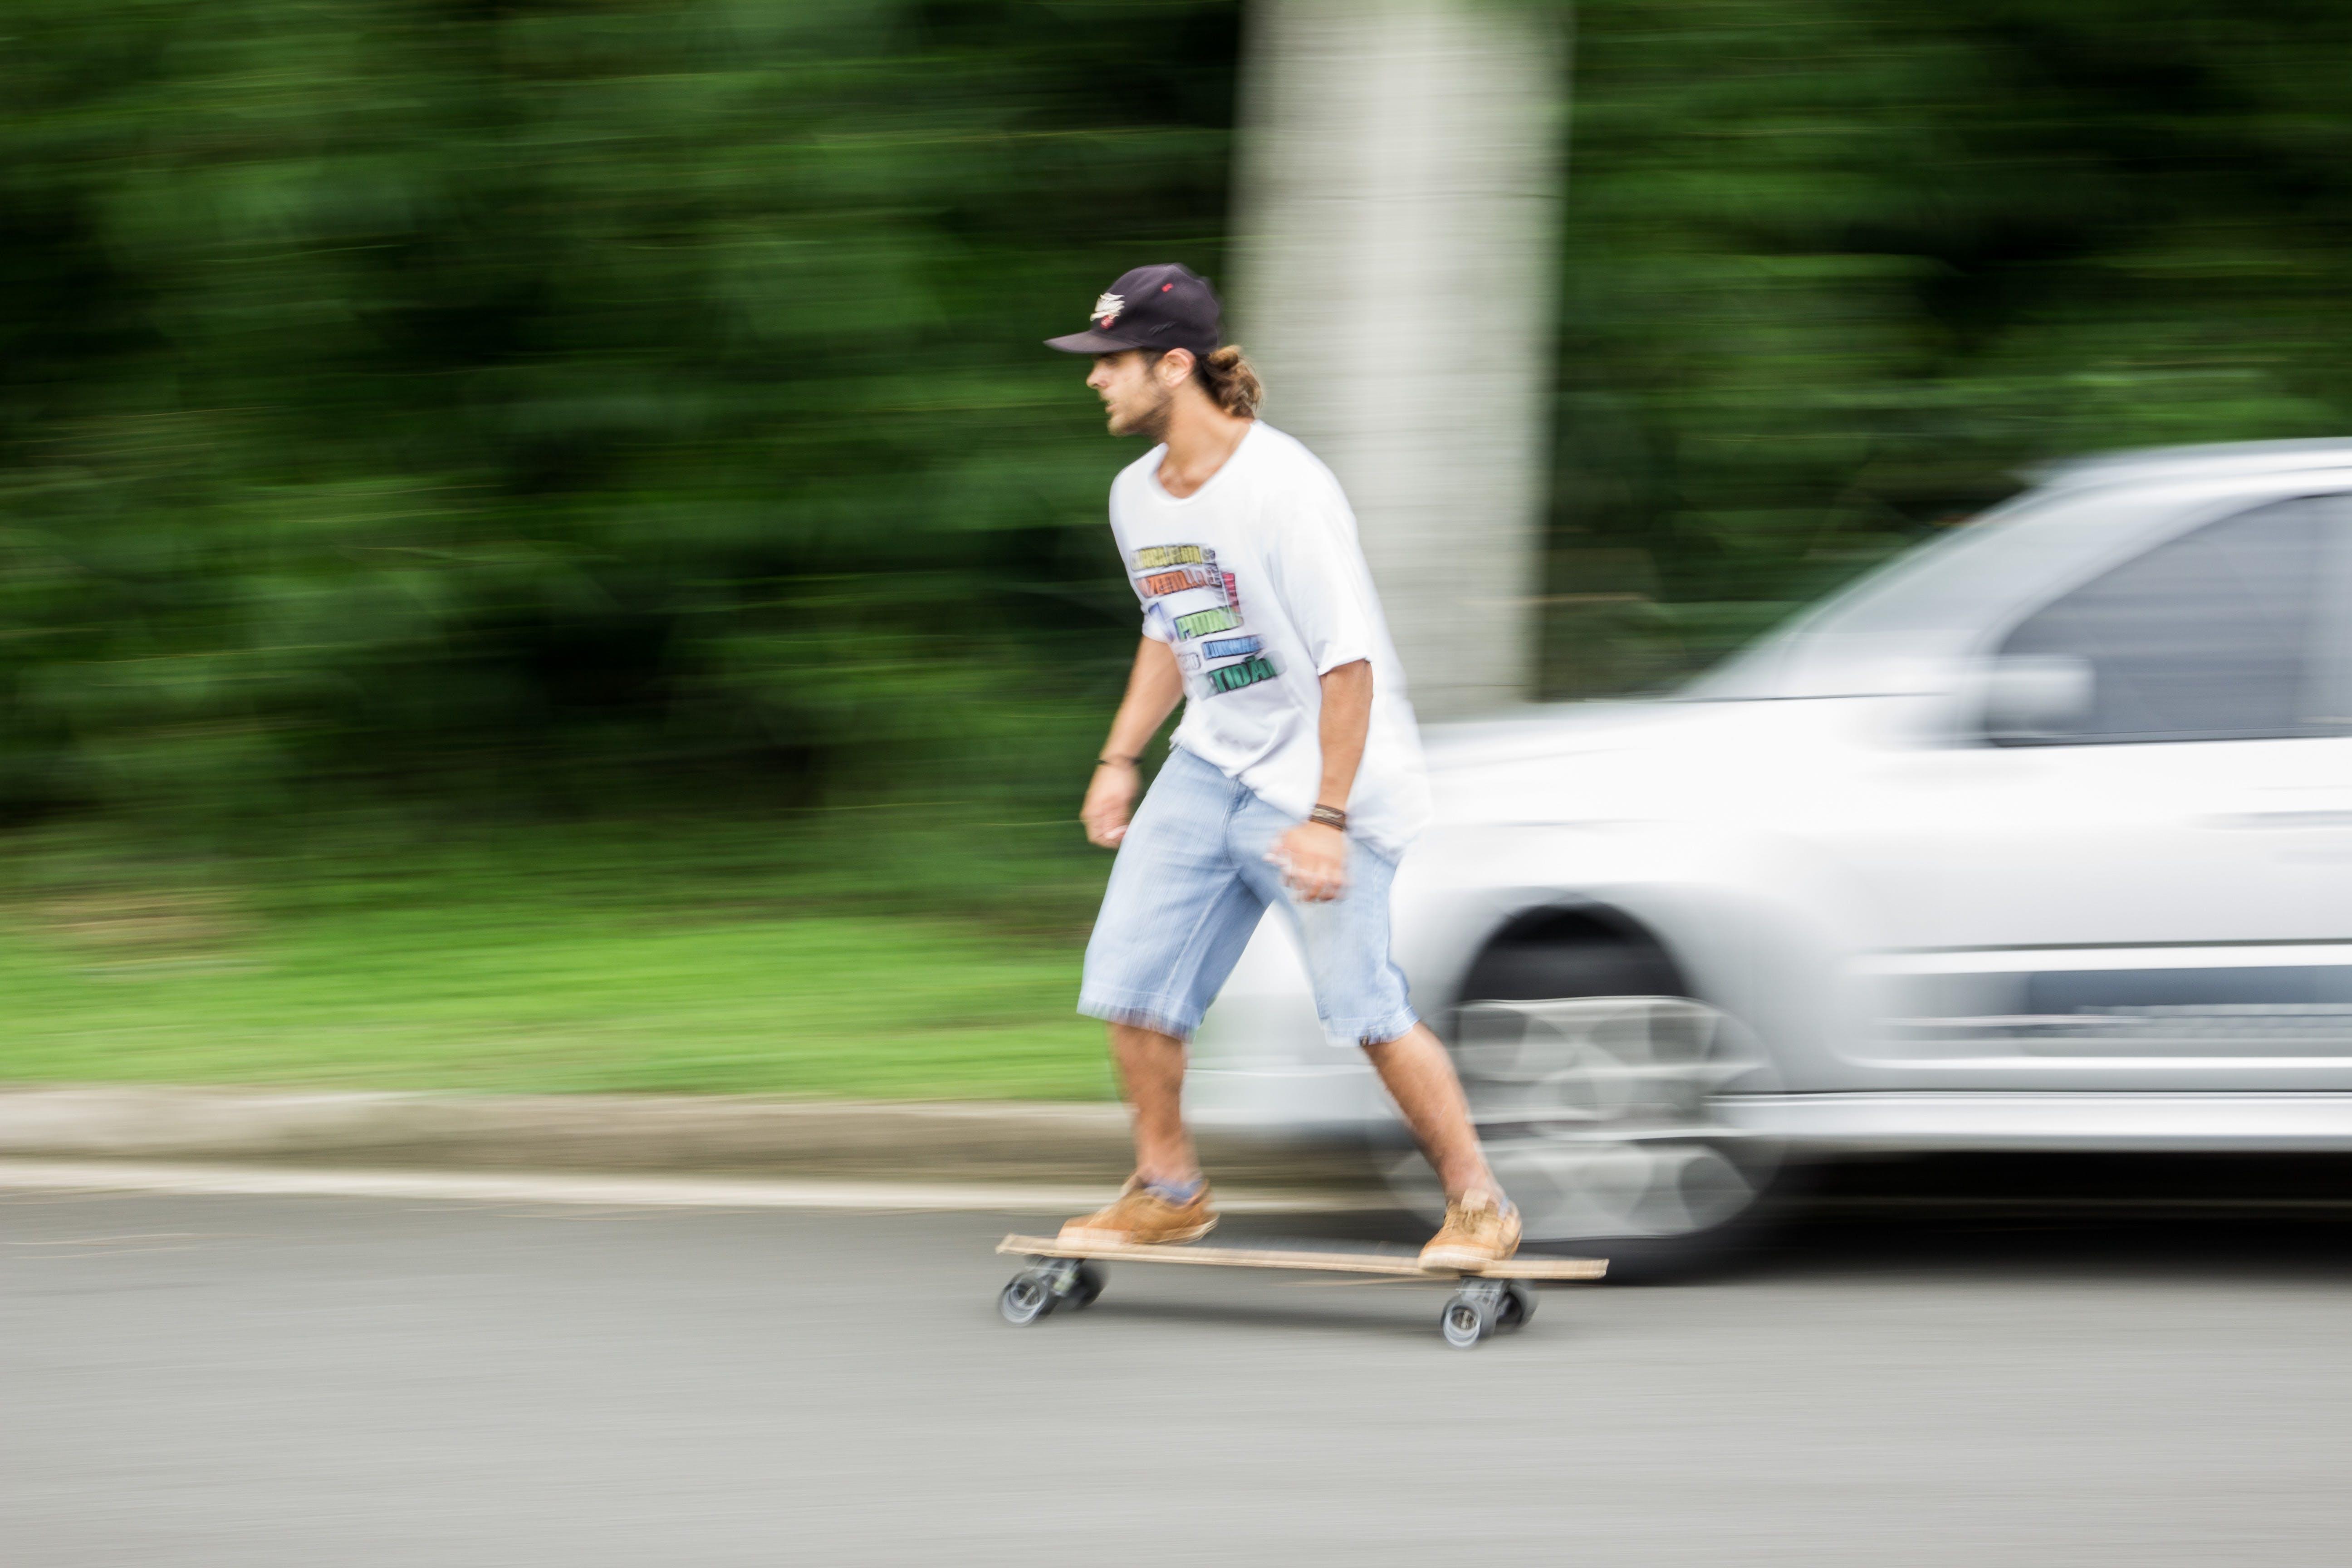 Kostnadsfri bild av asfalt, bil, dagsljus, fart